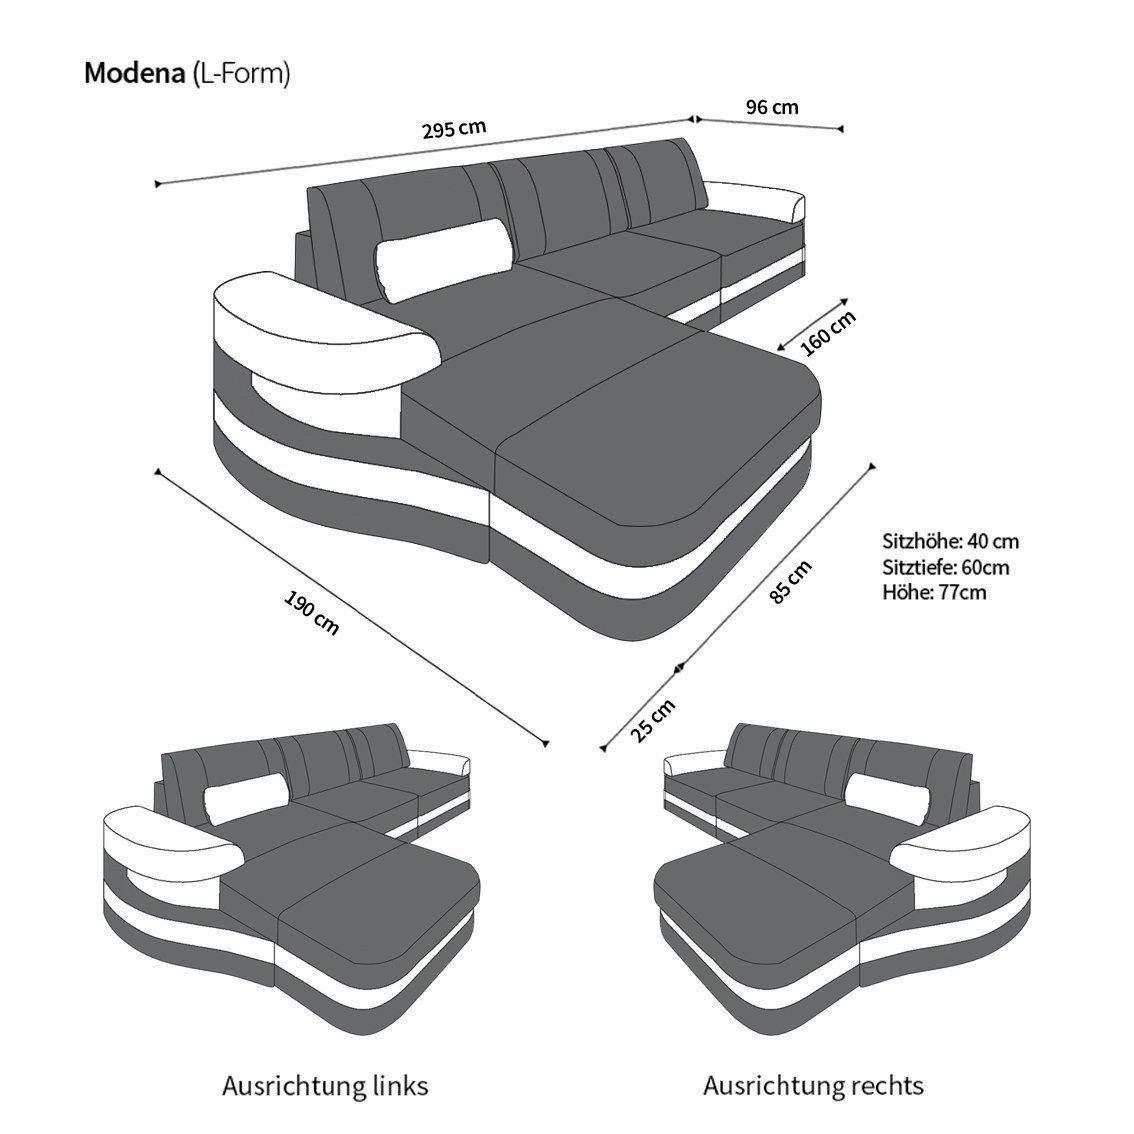 ledersofa modena in der l form als ecksofa mit farbe weiss beige. Black Bedroom Furniture Sets. Home Design Ideas